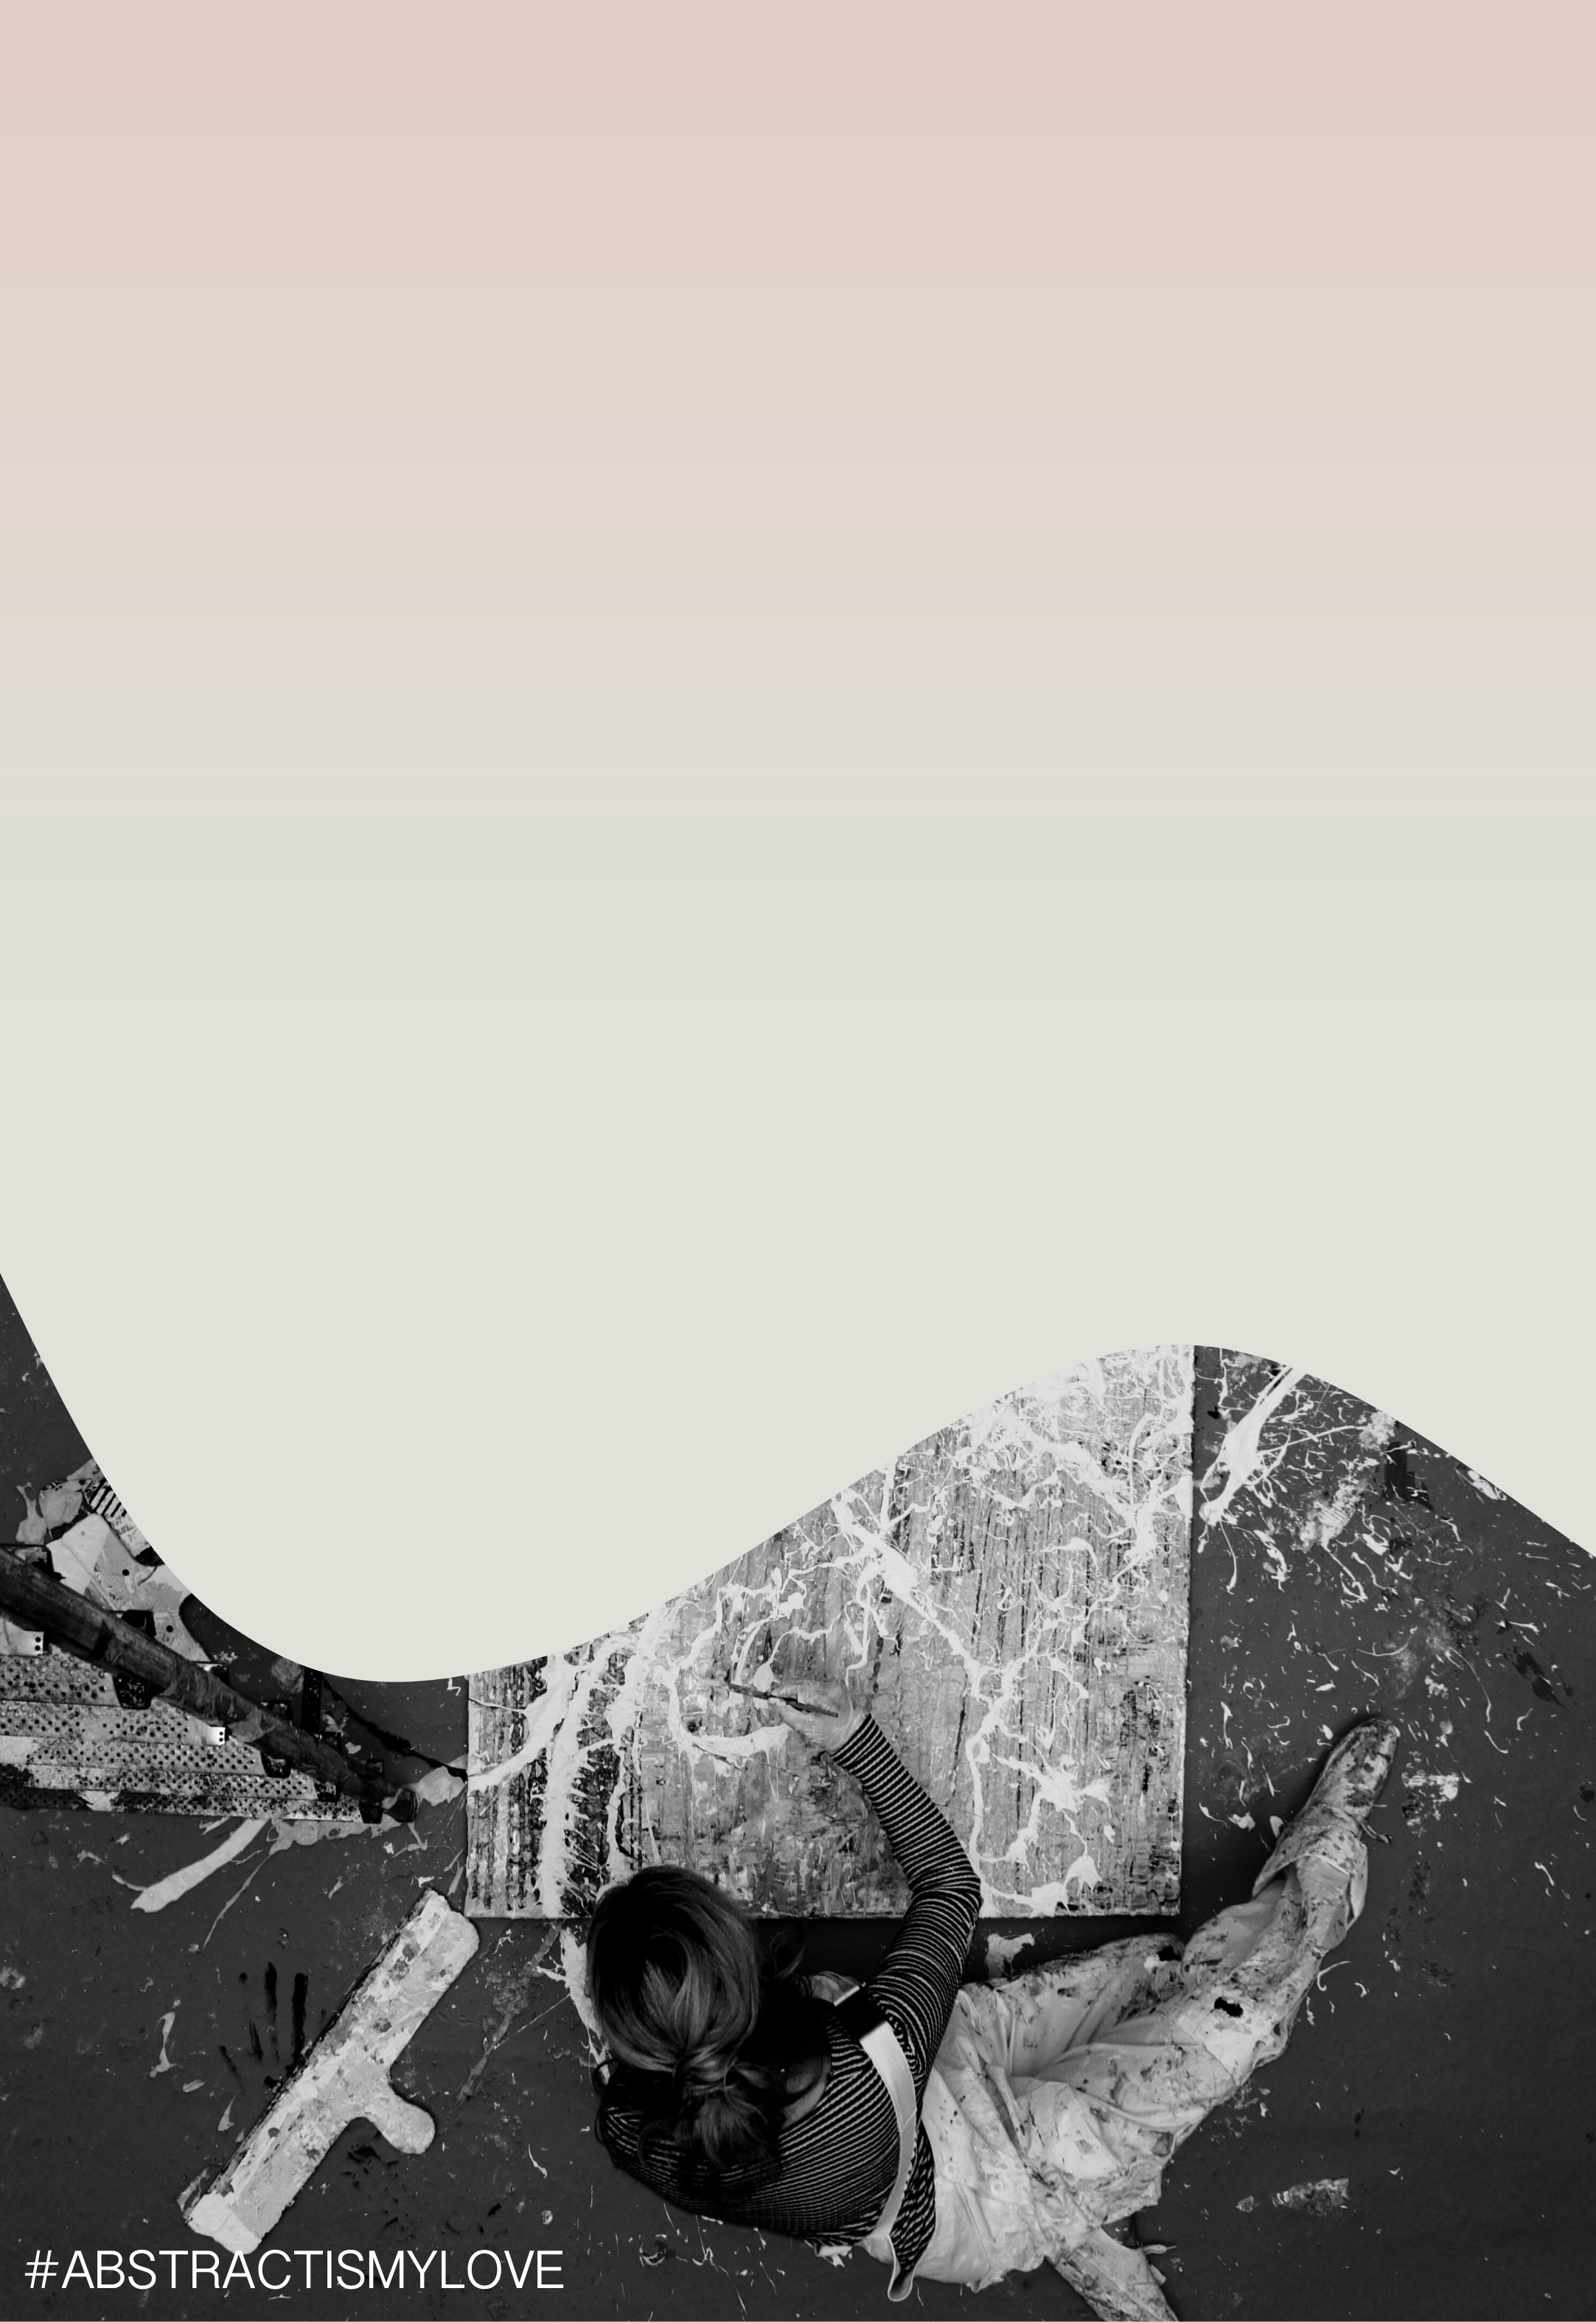 THERESA KALLRATH BEAUX ART PARIS KUNSTAKADEMIE DÜSSELDORF ARTIST ABSTRAKT RUNDGANG 2018 LOVE